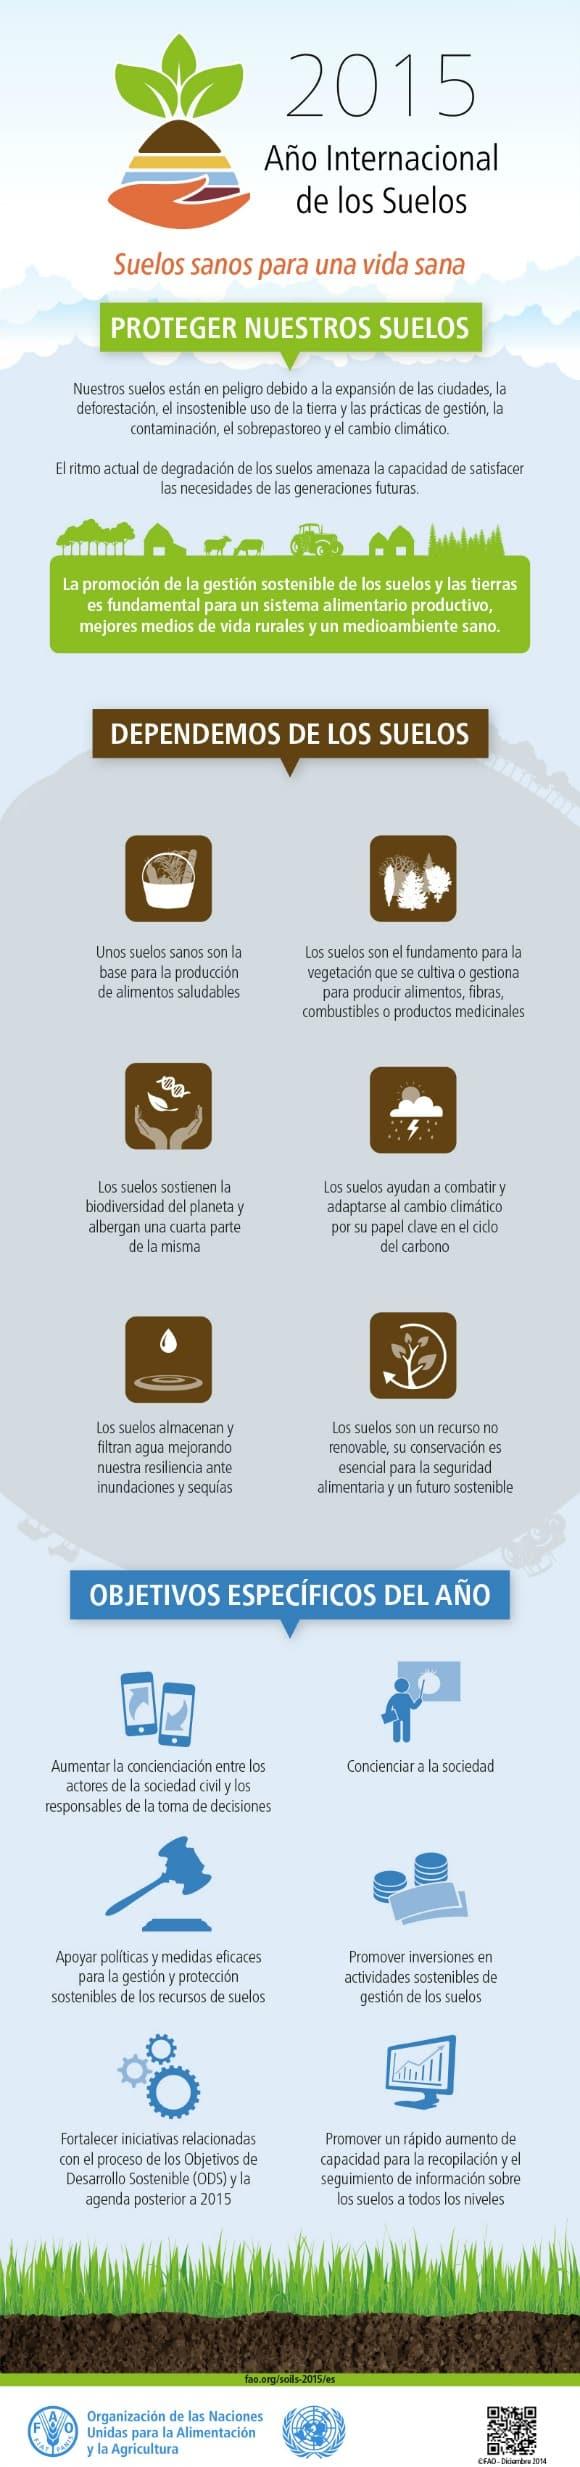 FAO-Infographic-IYS2015-es